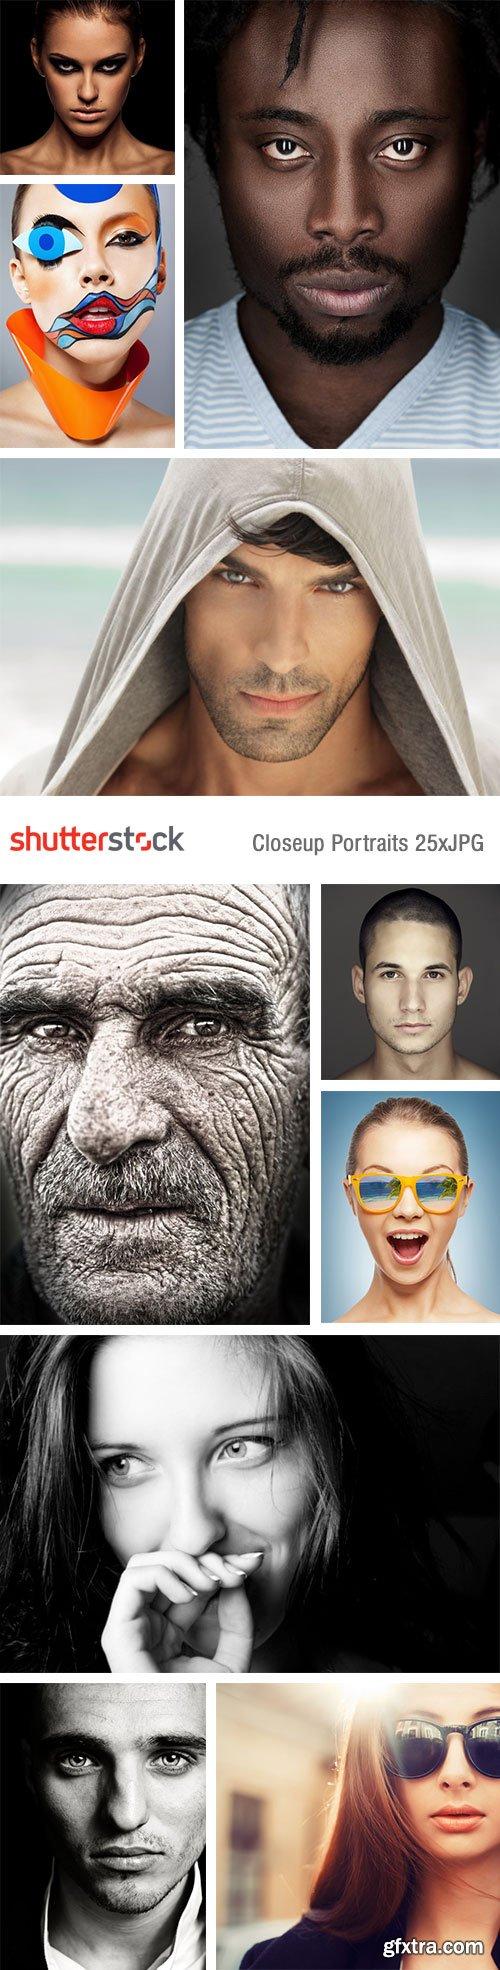 Closeup Portraits 25xJPG